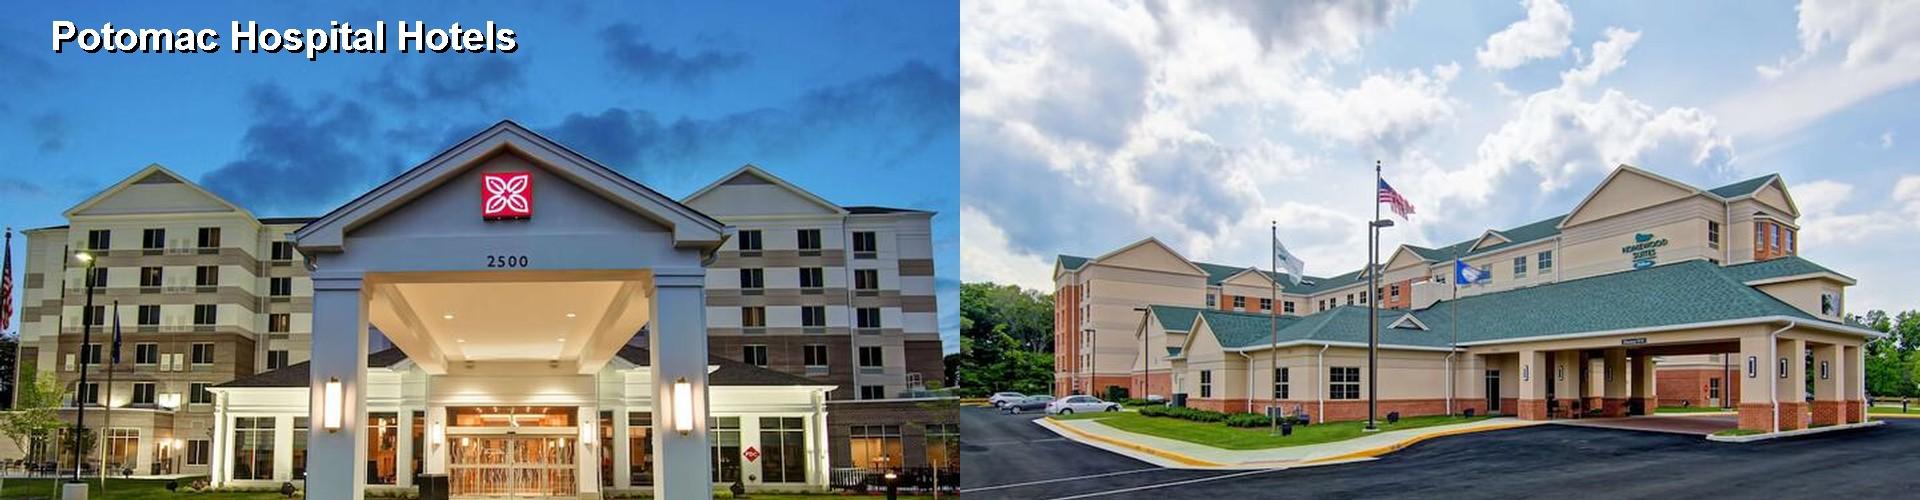 5 Best Hotels Near Potomac Hospital